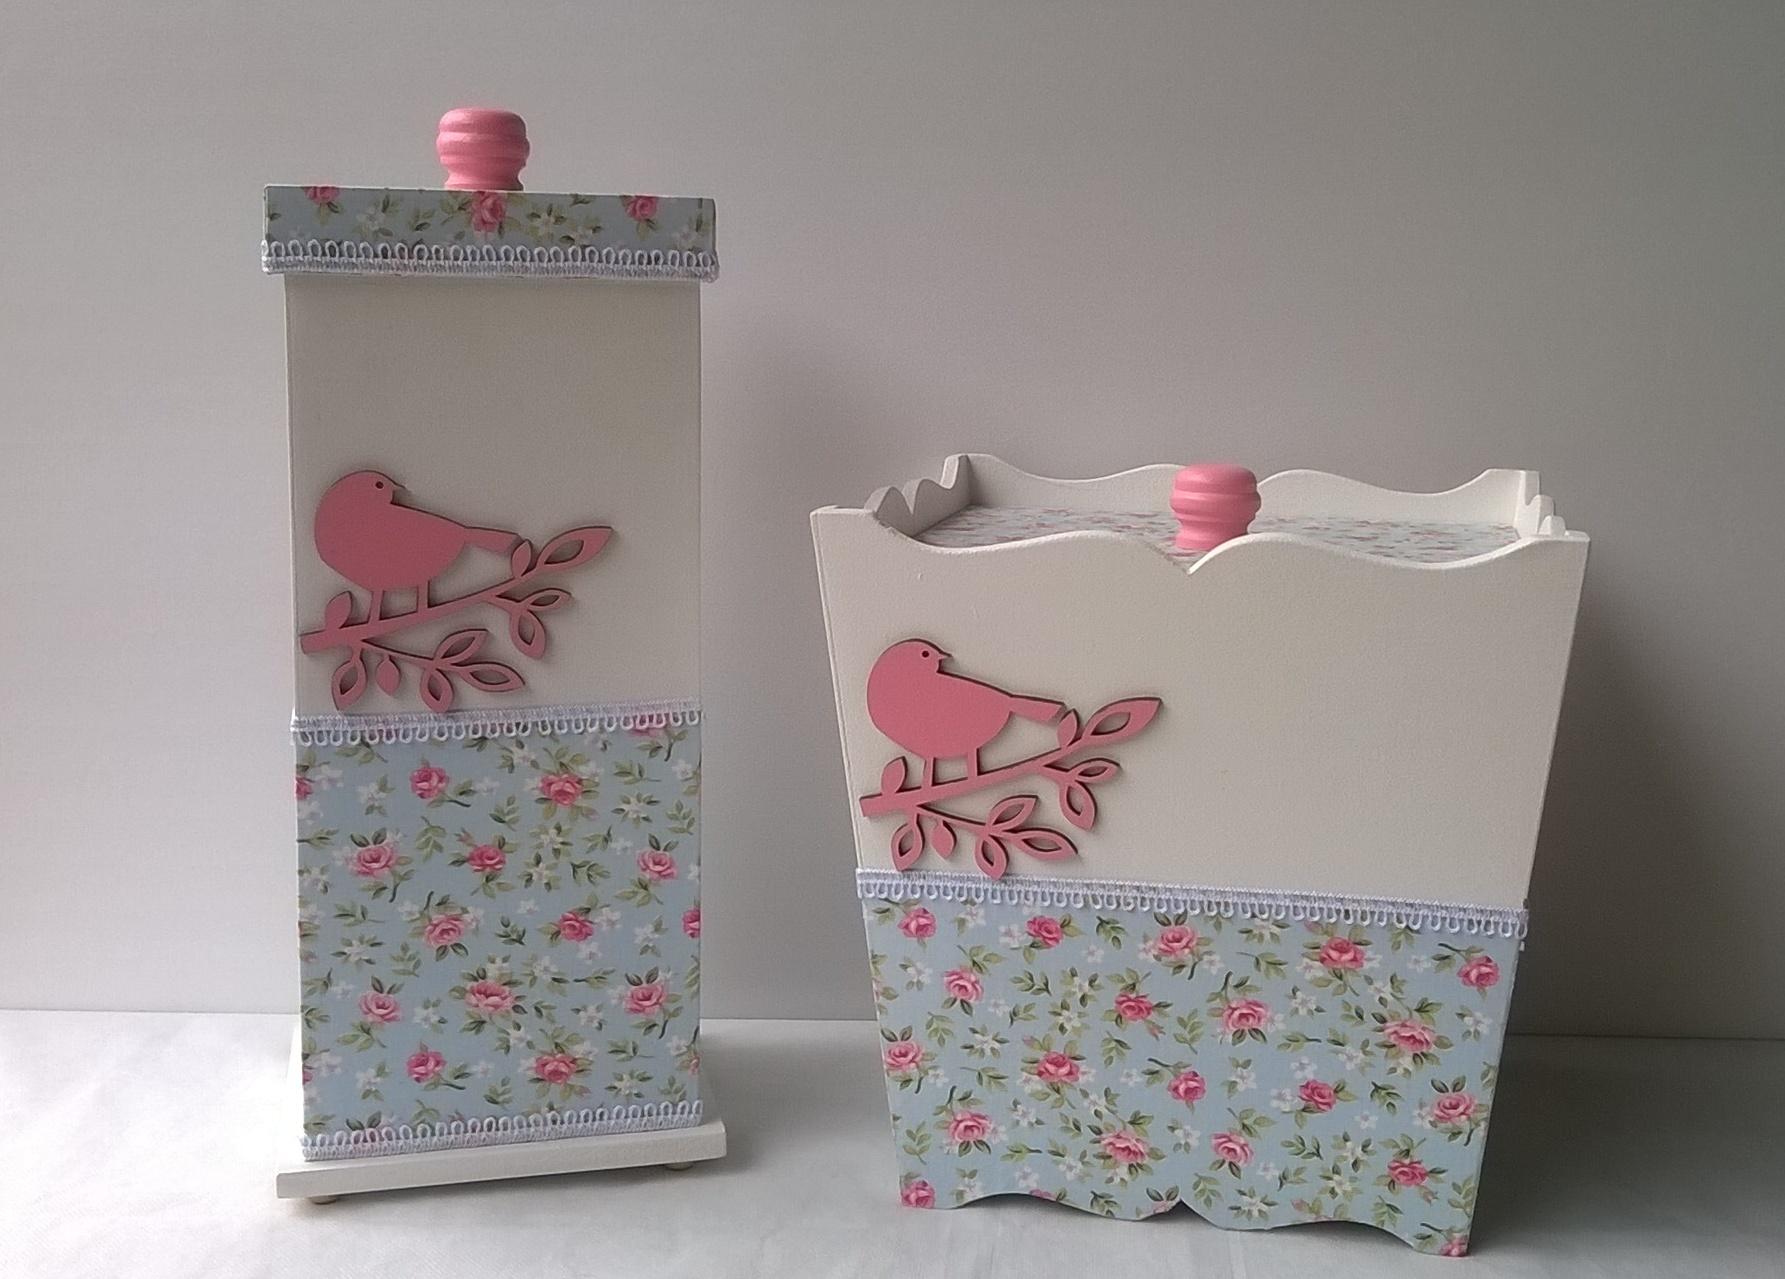 Adesivo De Banheiro Pastilha ~ Kit de banheiro Art Sol Artesanato